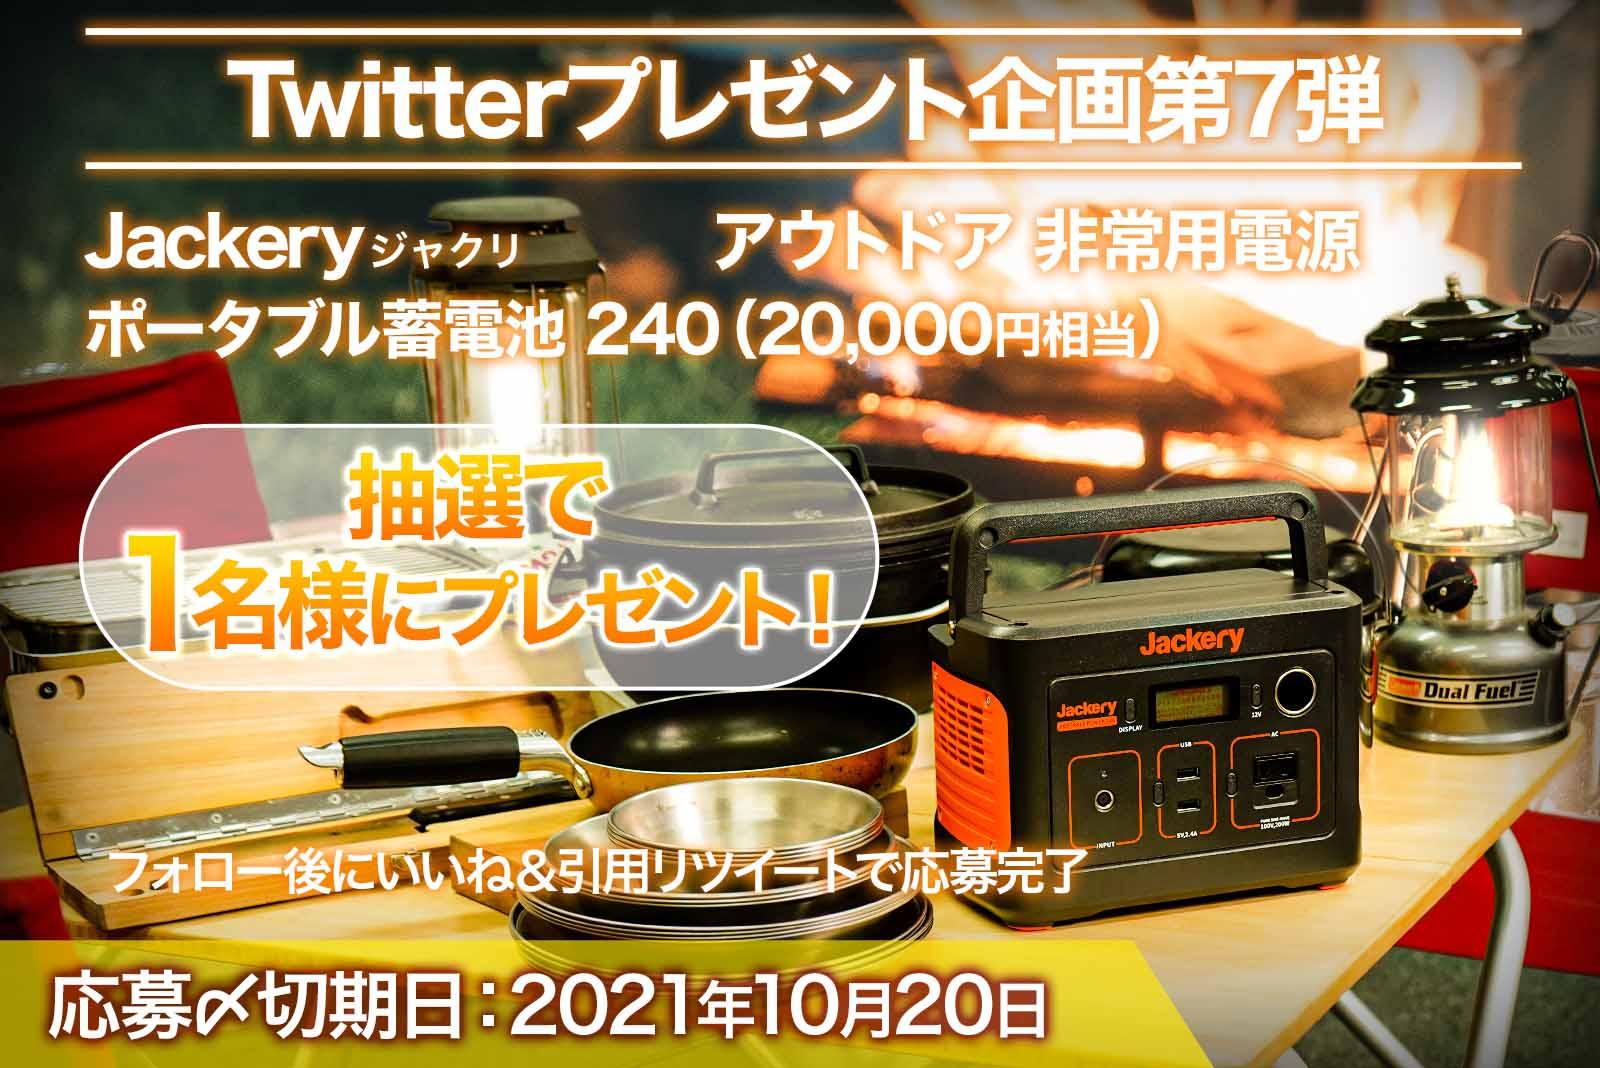 【twitterプレゼント企画第7弾】2万円相当のポータブル電源が当たる!10月20日(水)応募〆切